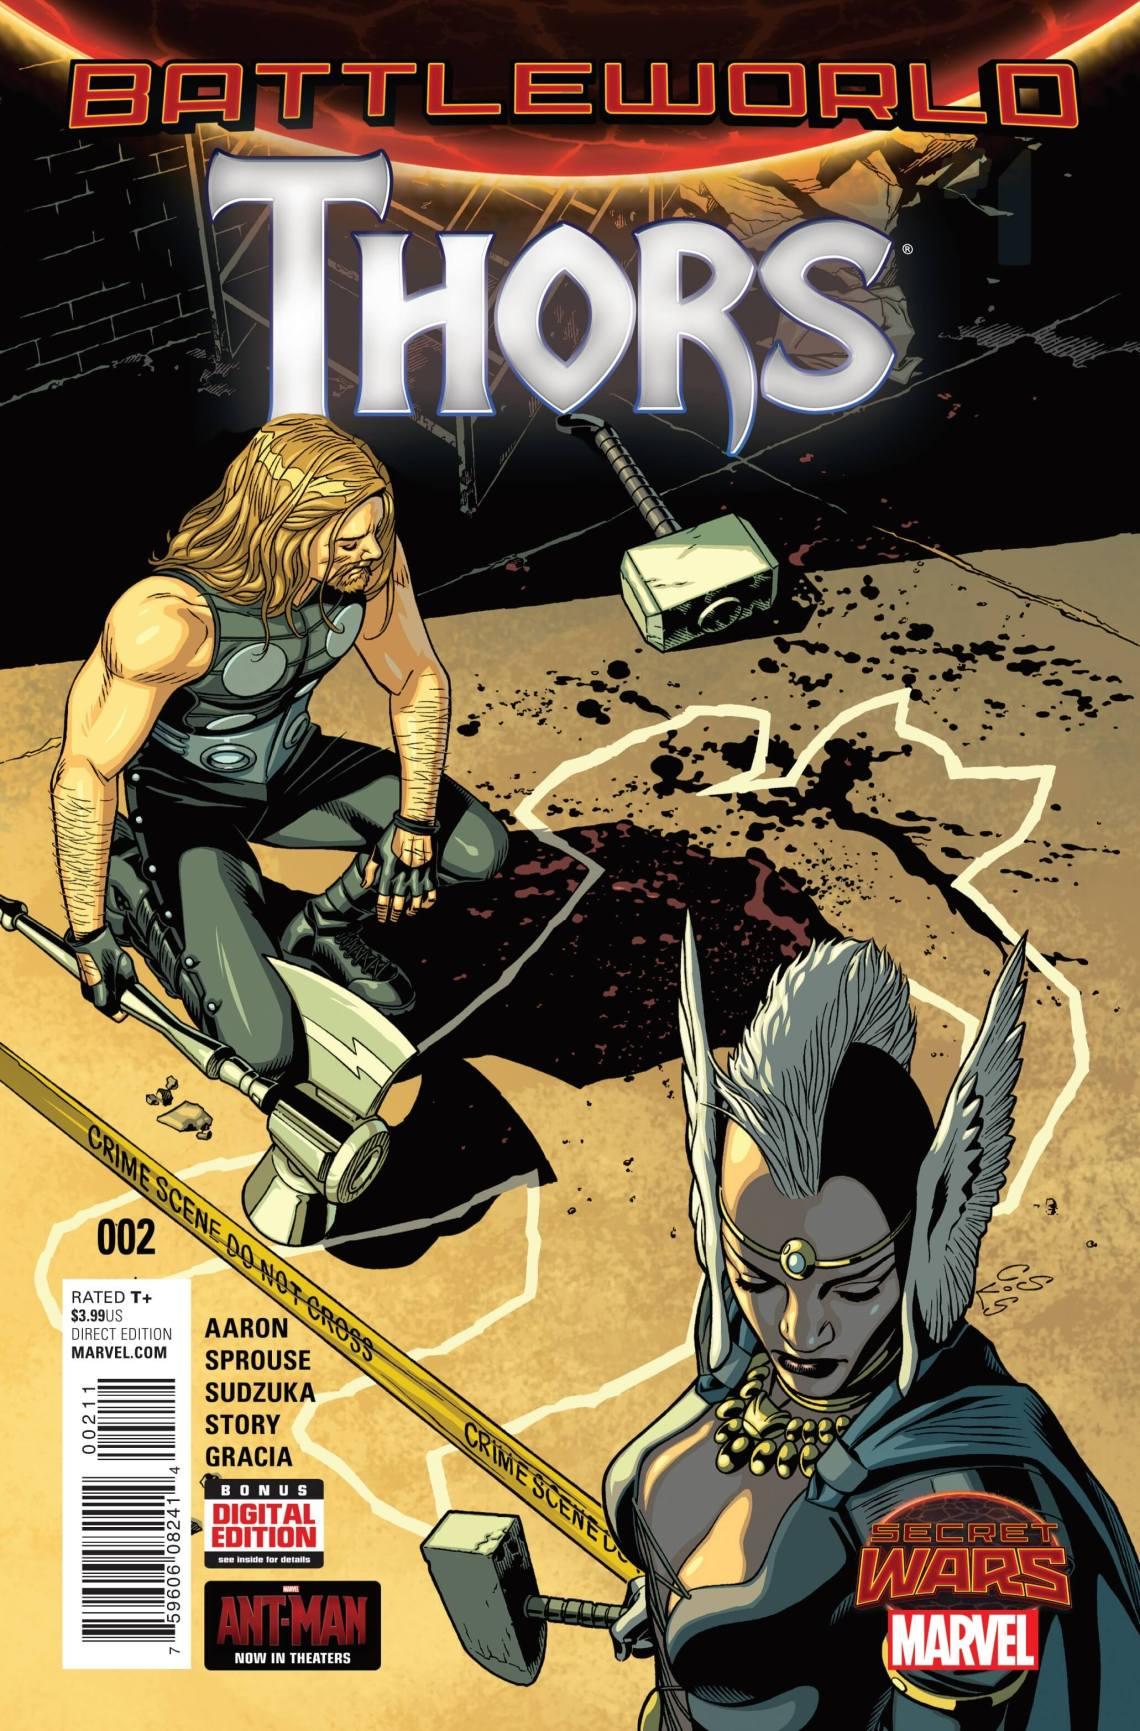 Thors002cvrA